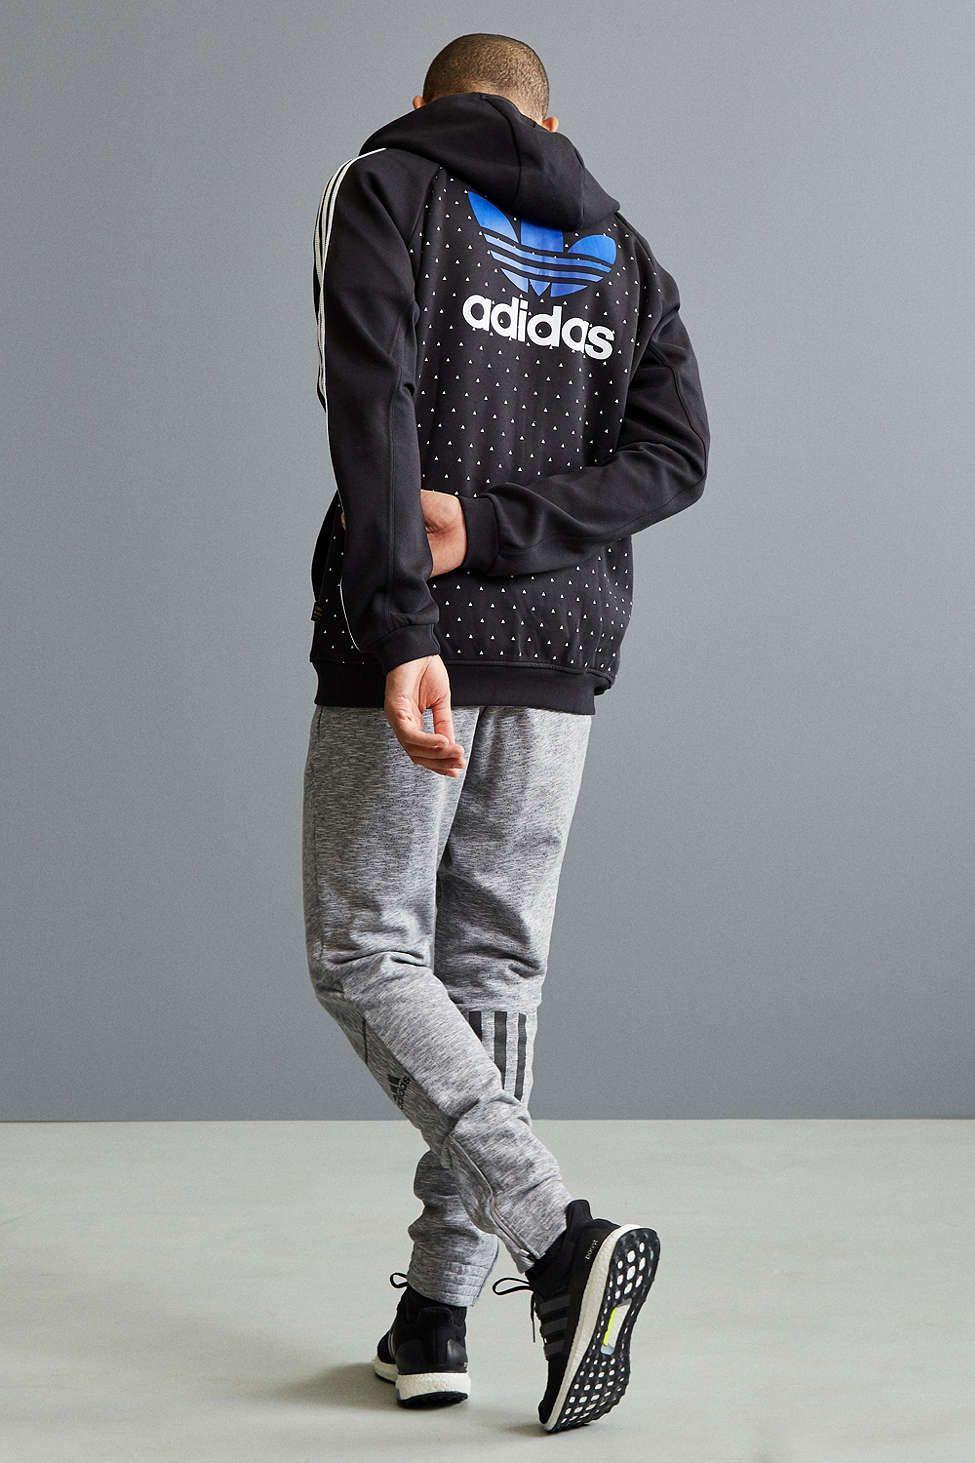 Adidas X Pharrell Williams Zip Hoodie Sweatshirt Zip Hoodie Sweatshirt Hoodies Sweatshirts [ 1463 x 975 Pixel ]